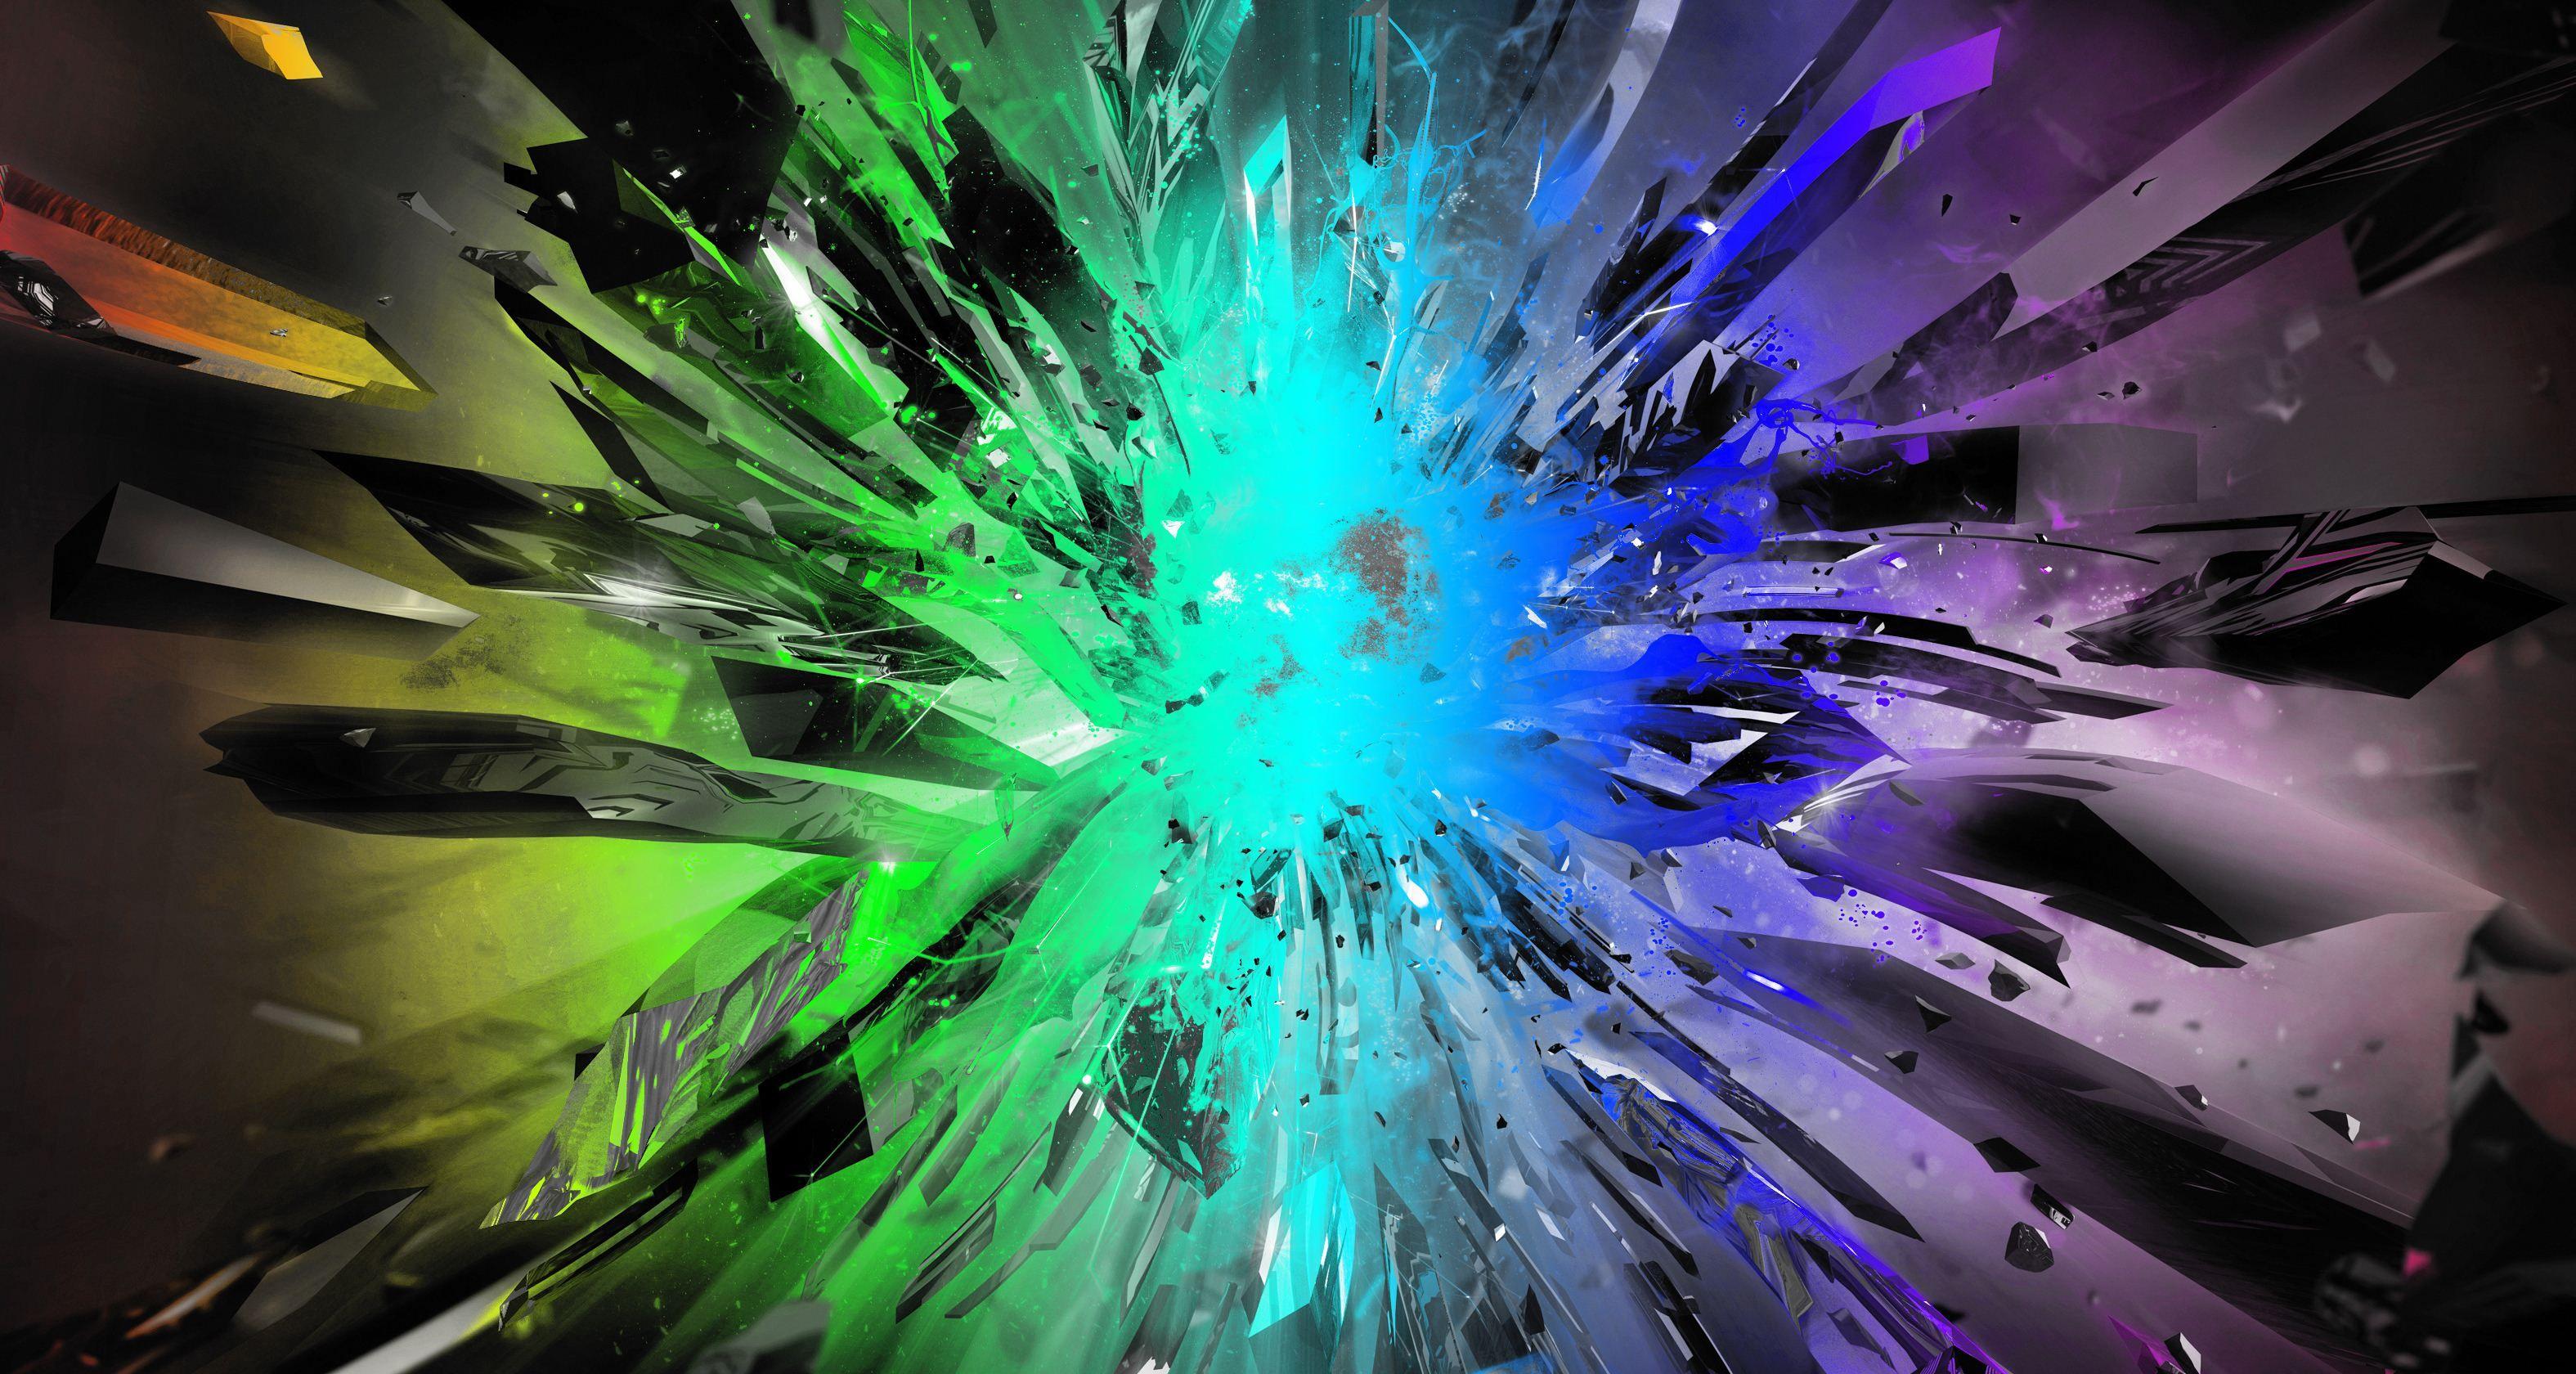 Crystal colorful explosion wallpaper gemology geology - Explosion wallpaper ...